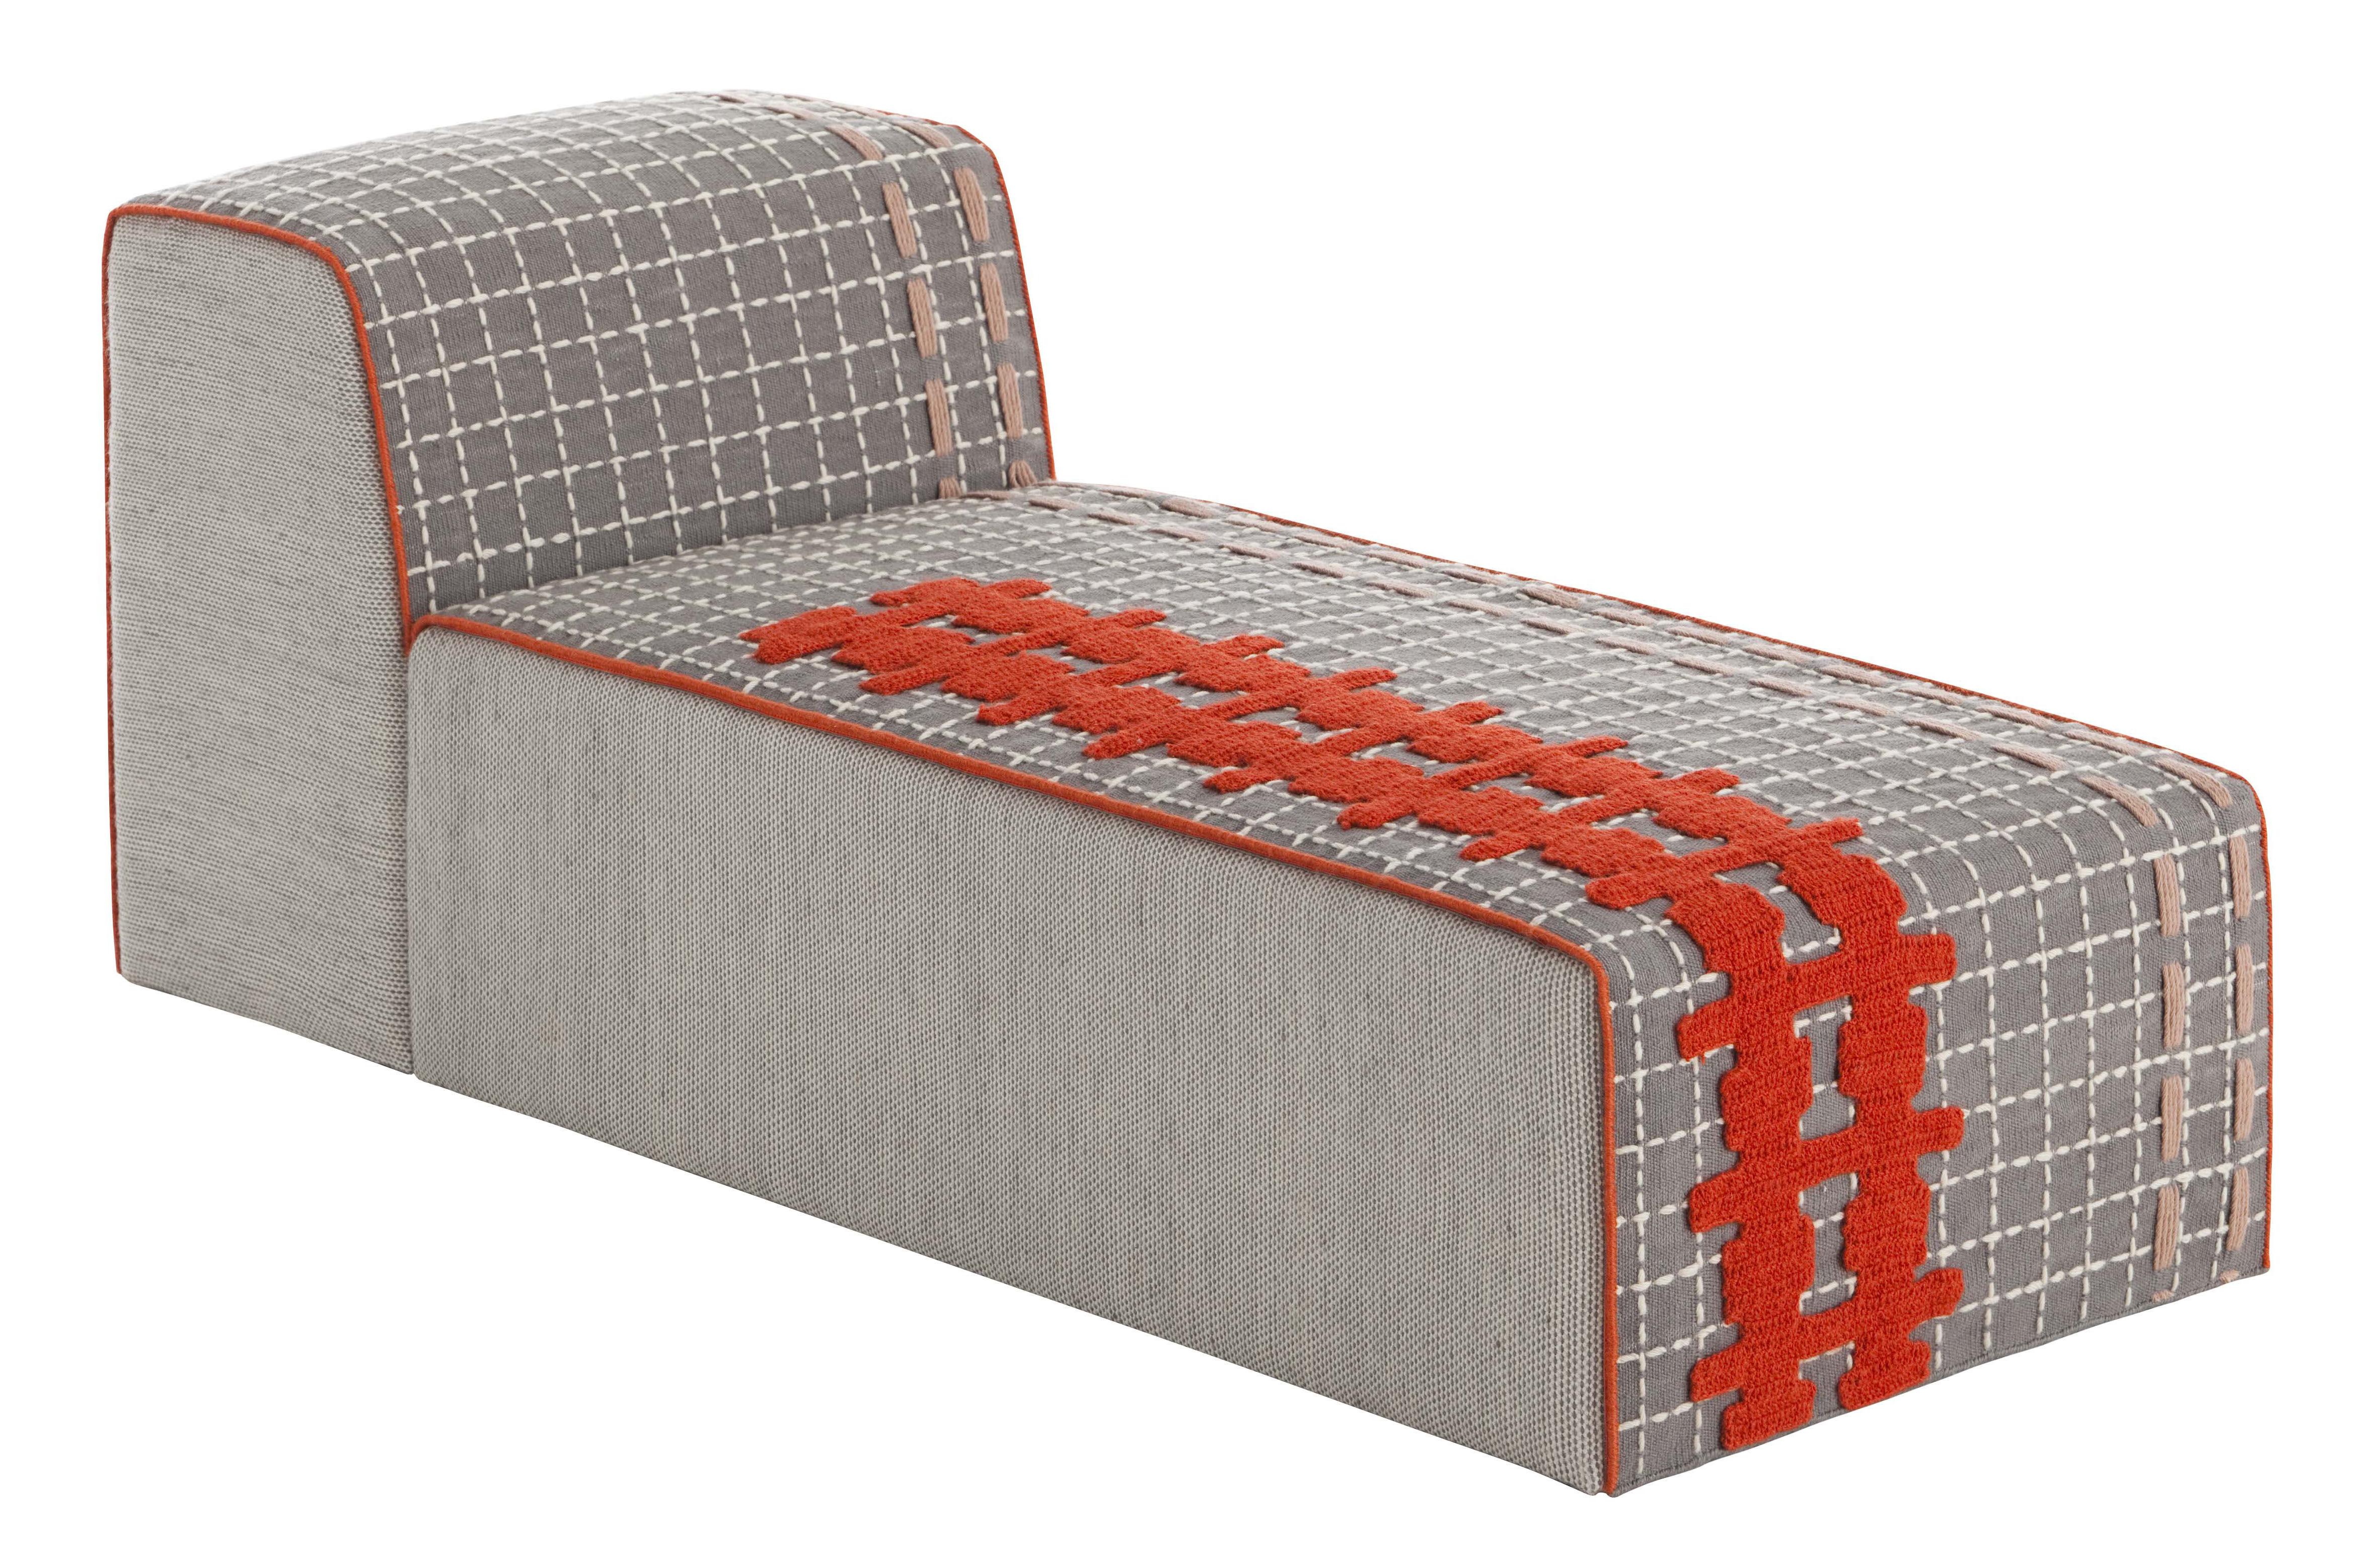 n 2 bandas set 1 rug 2 poufs large 1 chaise longue. Black Bedroom Furniture Sets. Home Design Ideas